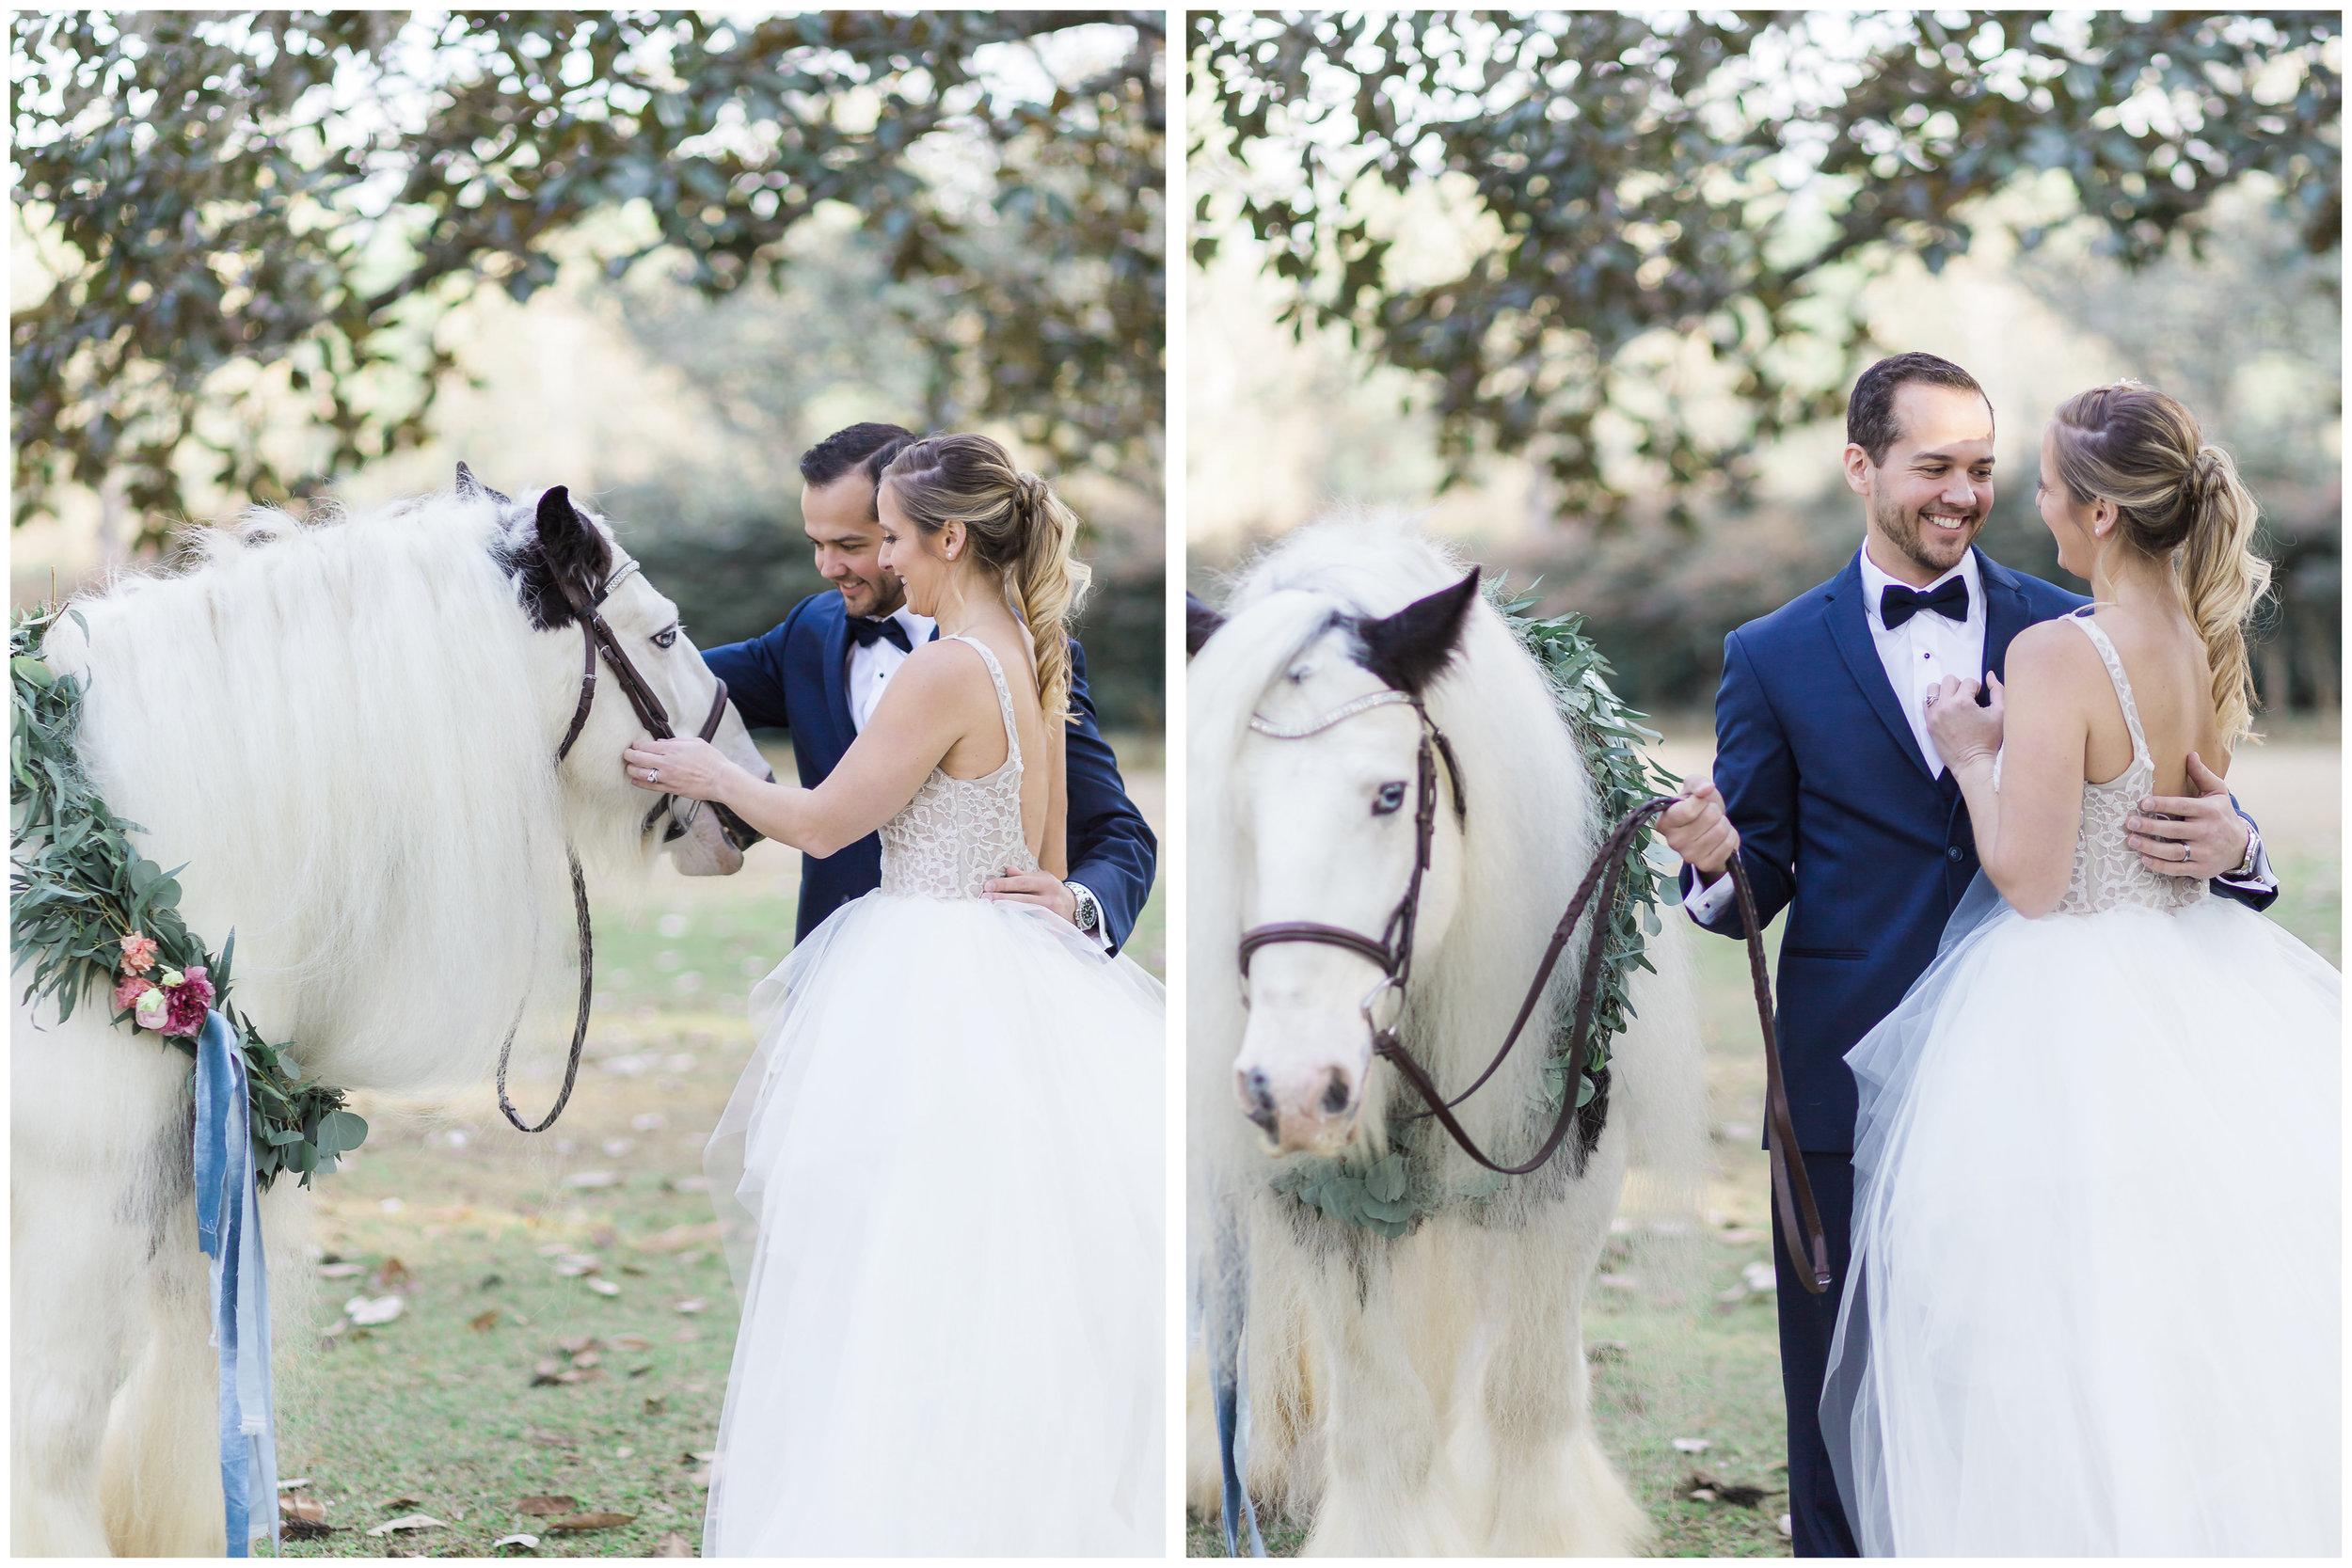 Thomasville wedding11.jpg